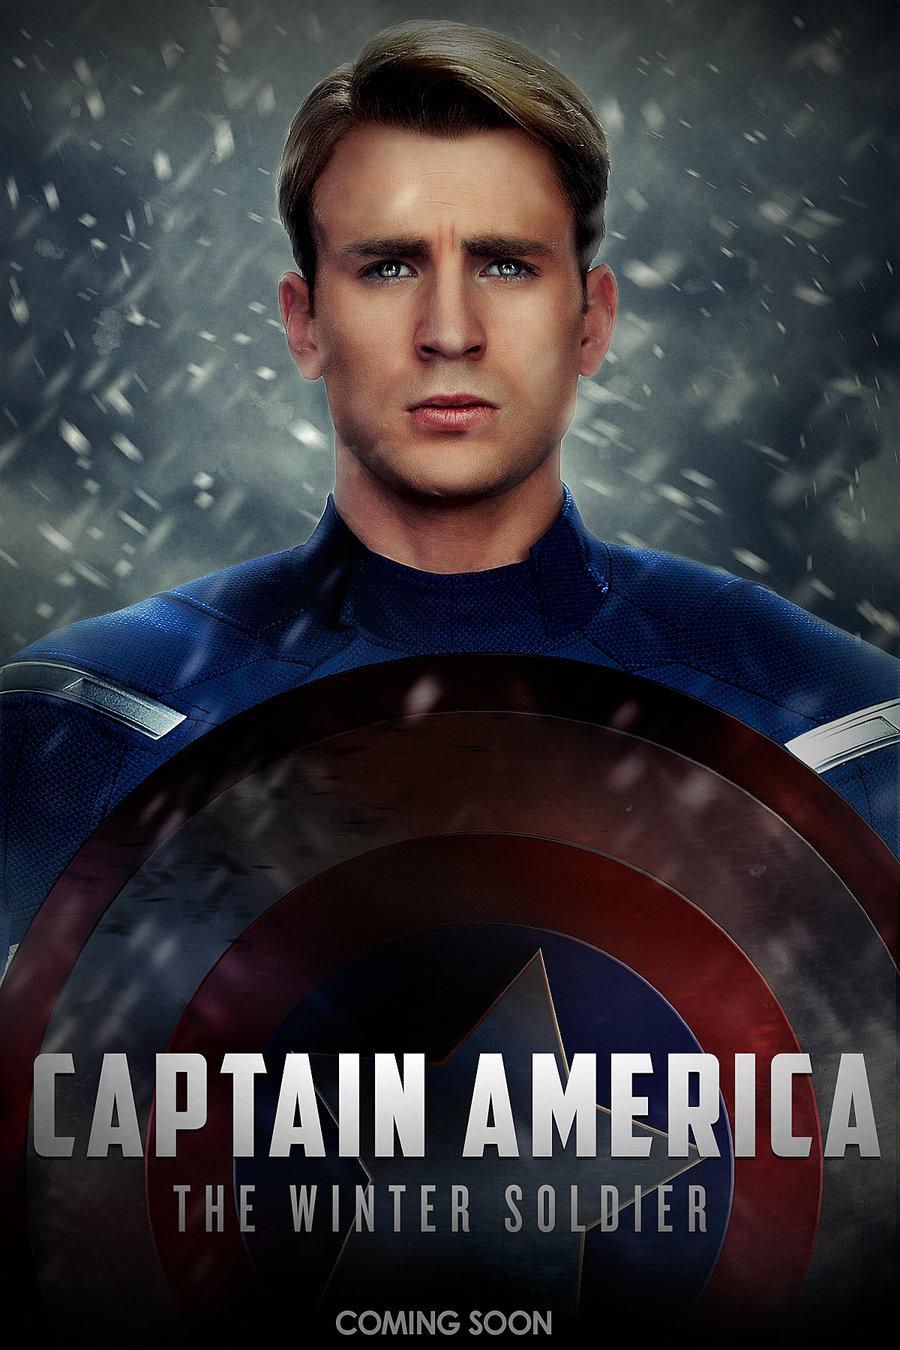 Captain-America-Winter-Soldier-poster.jpg